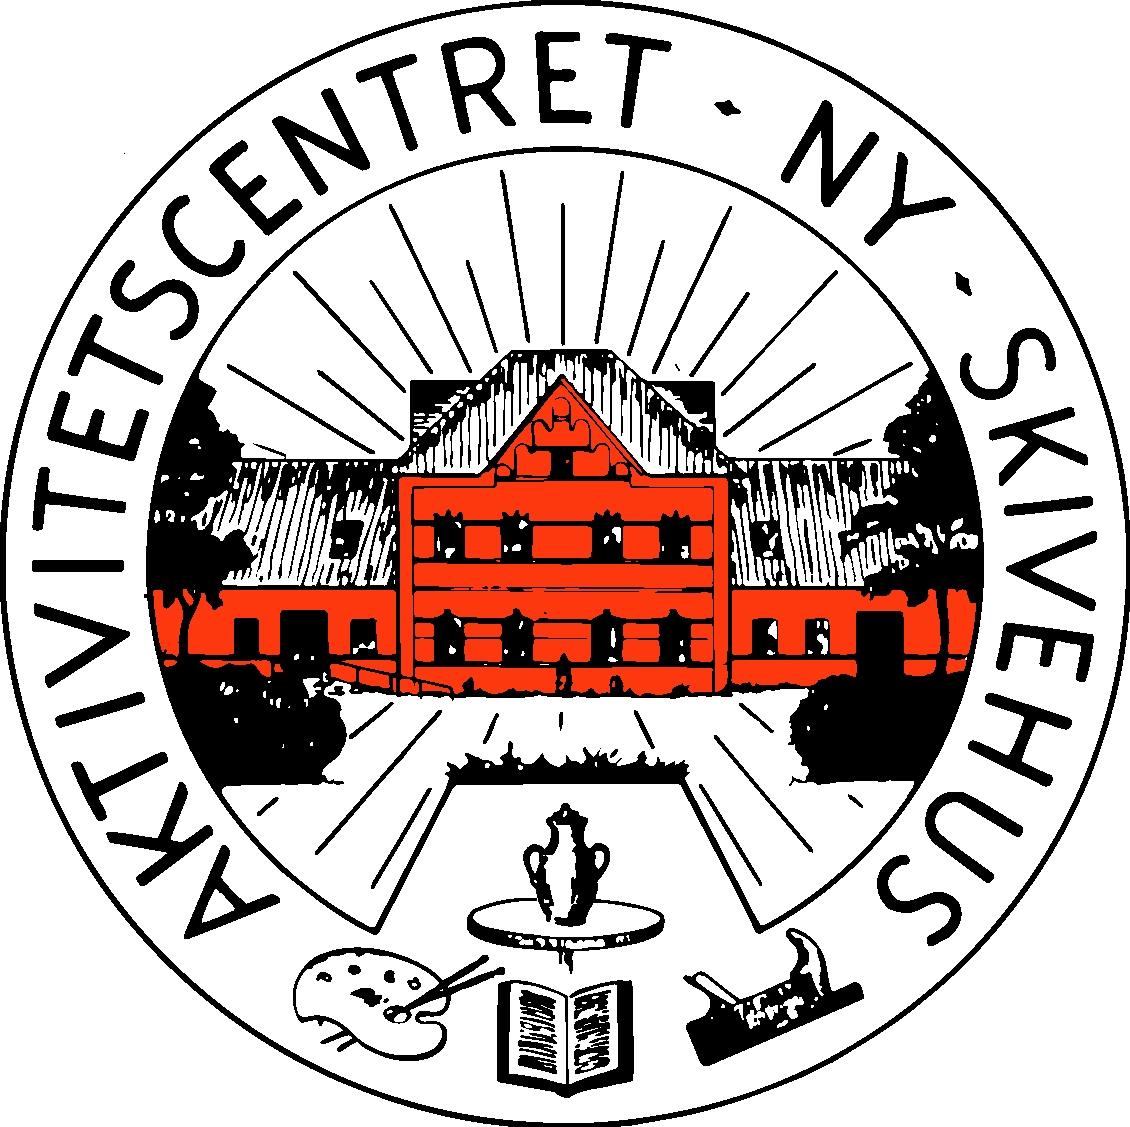 Aktivitetscentret Ny Skivehus